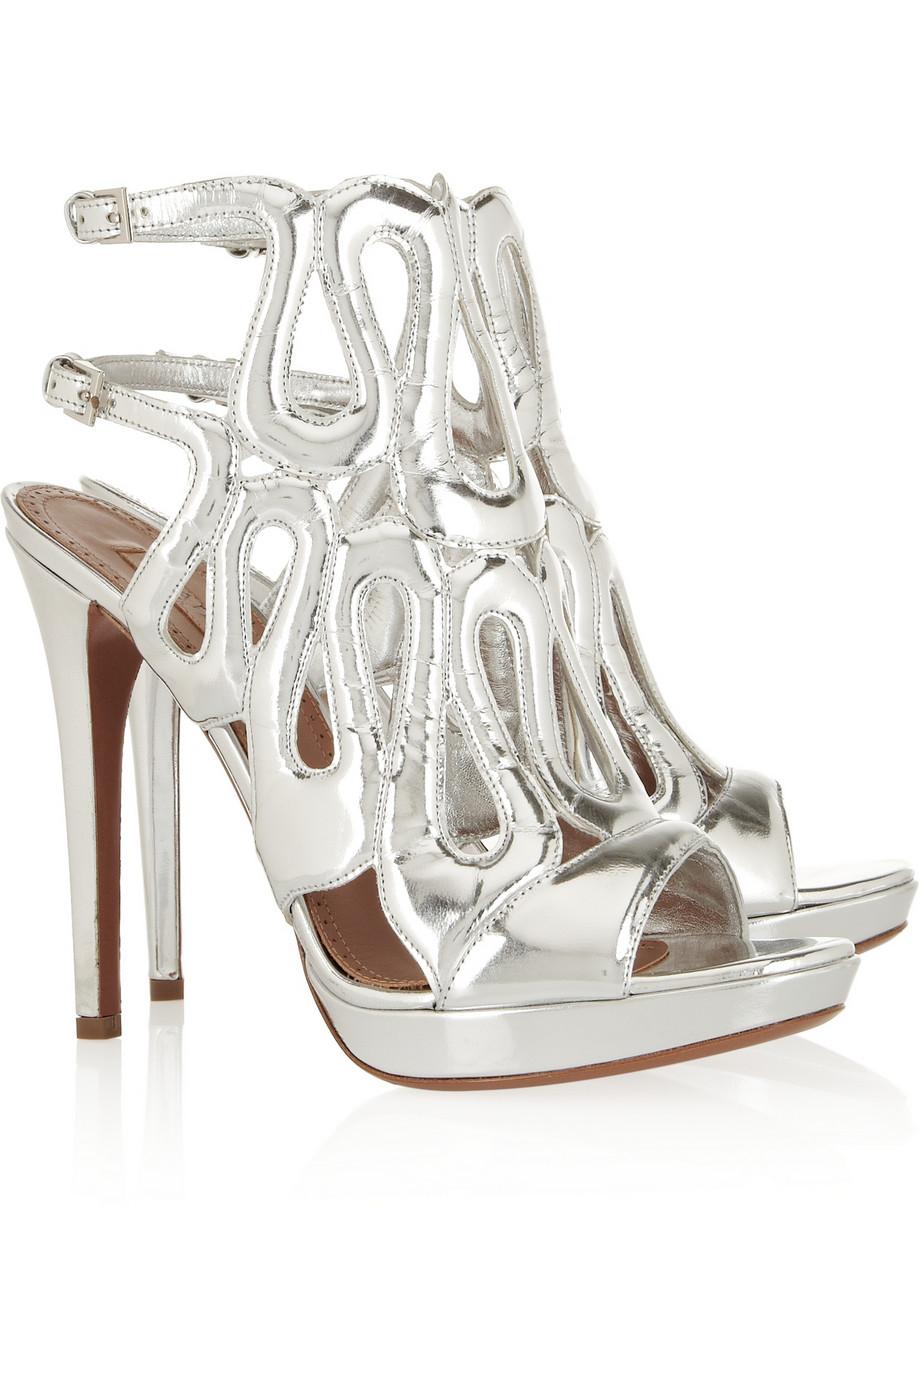 Alaïa Metallic silver leather sandals